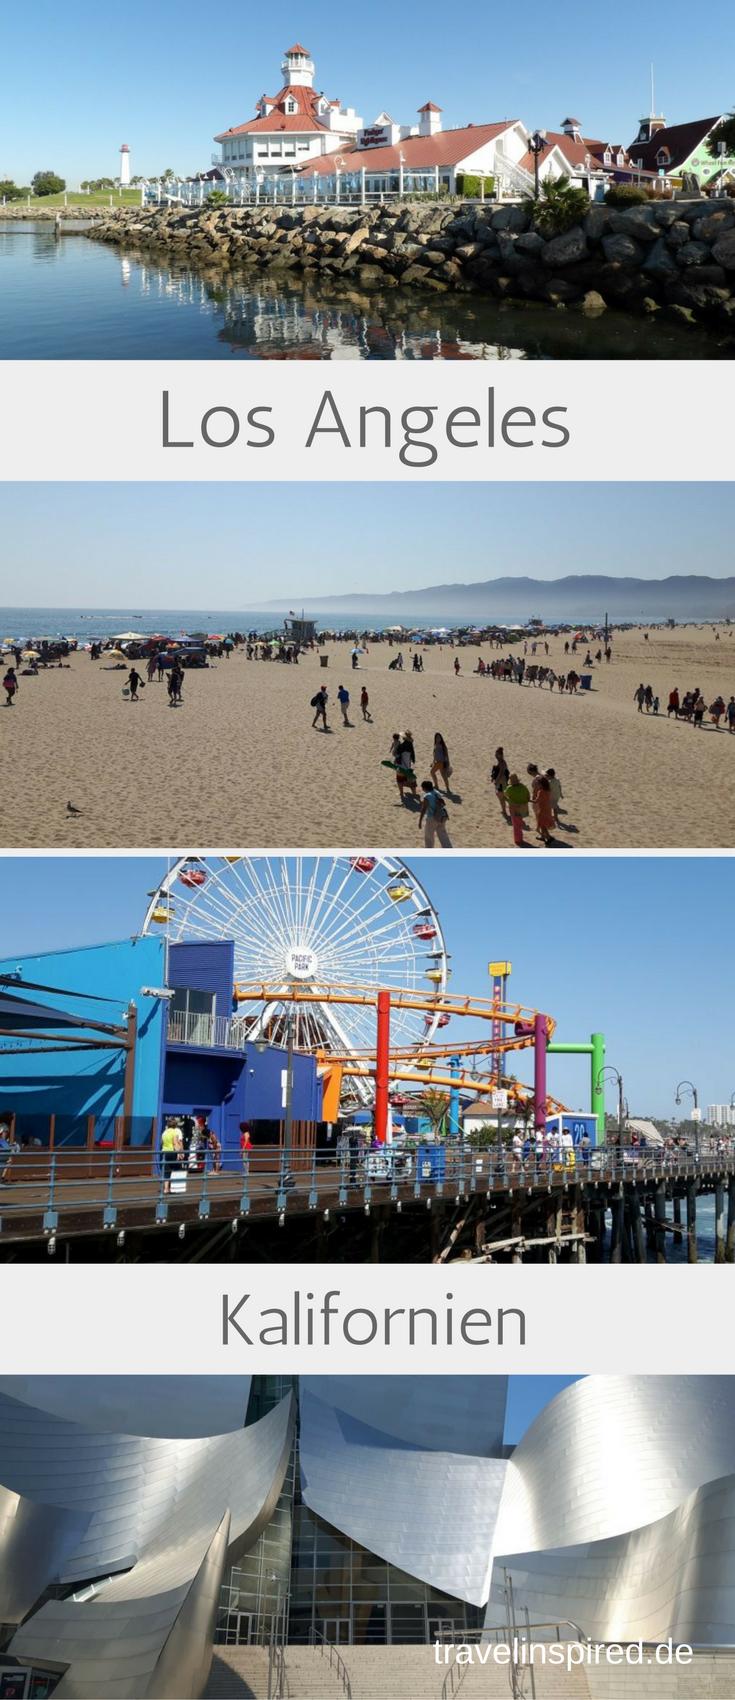 Los Angeles An Einem Tag Tipps Highlights Travelinspired Usa Reise Los Angeles Reisen